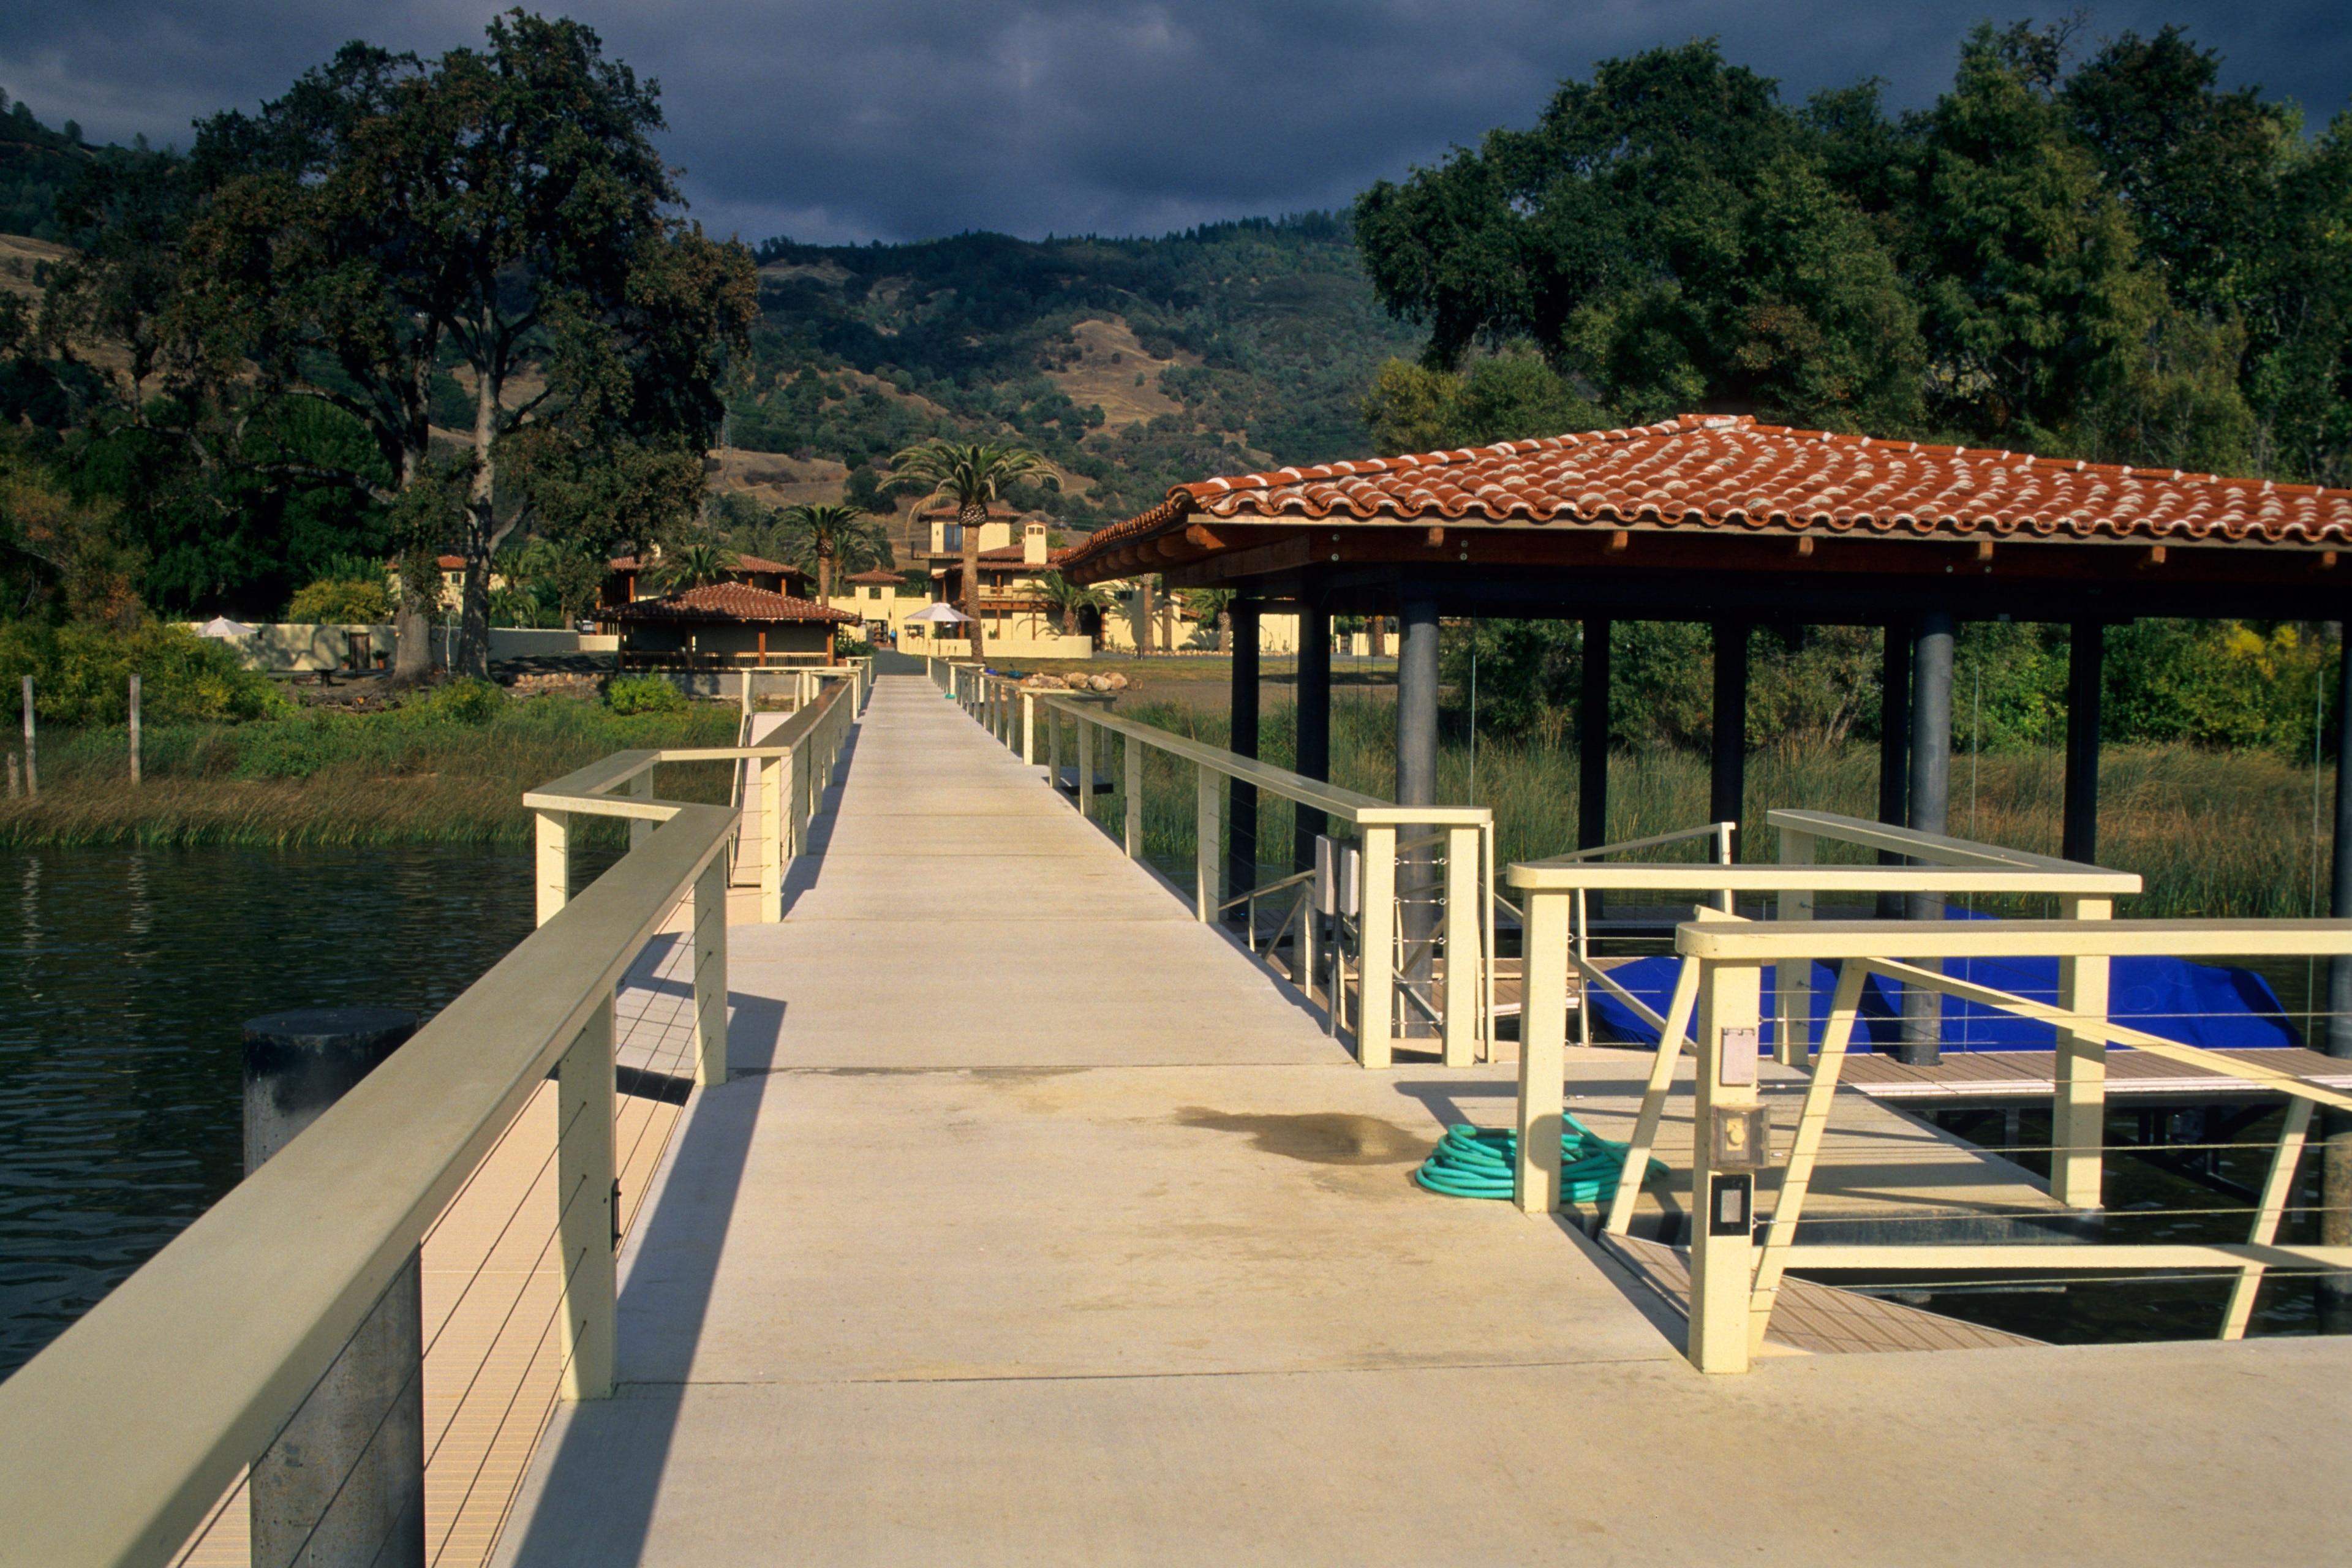 Lake County, California, United States of America